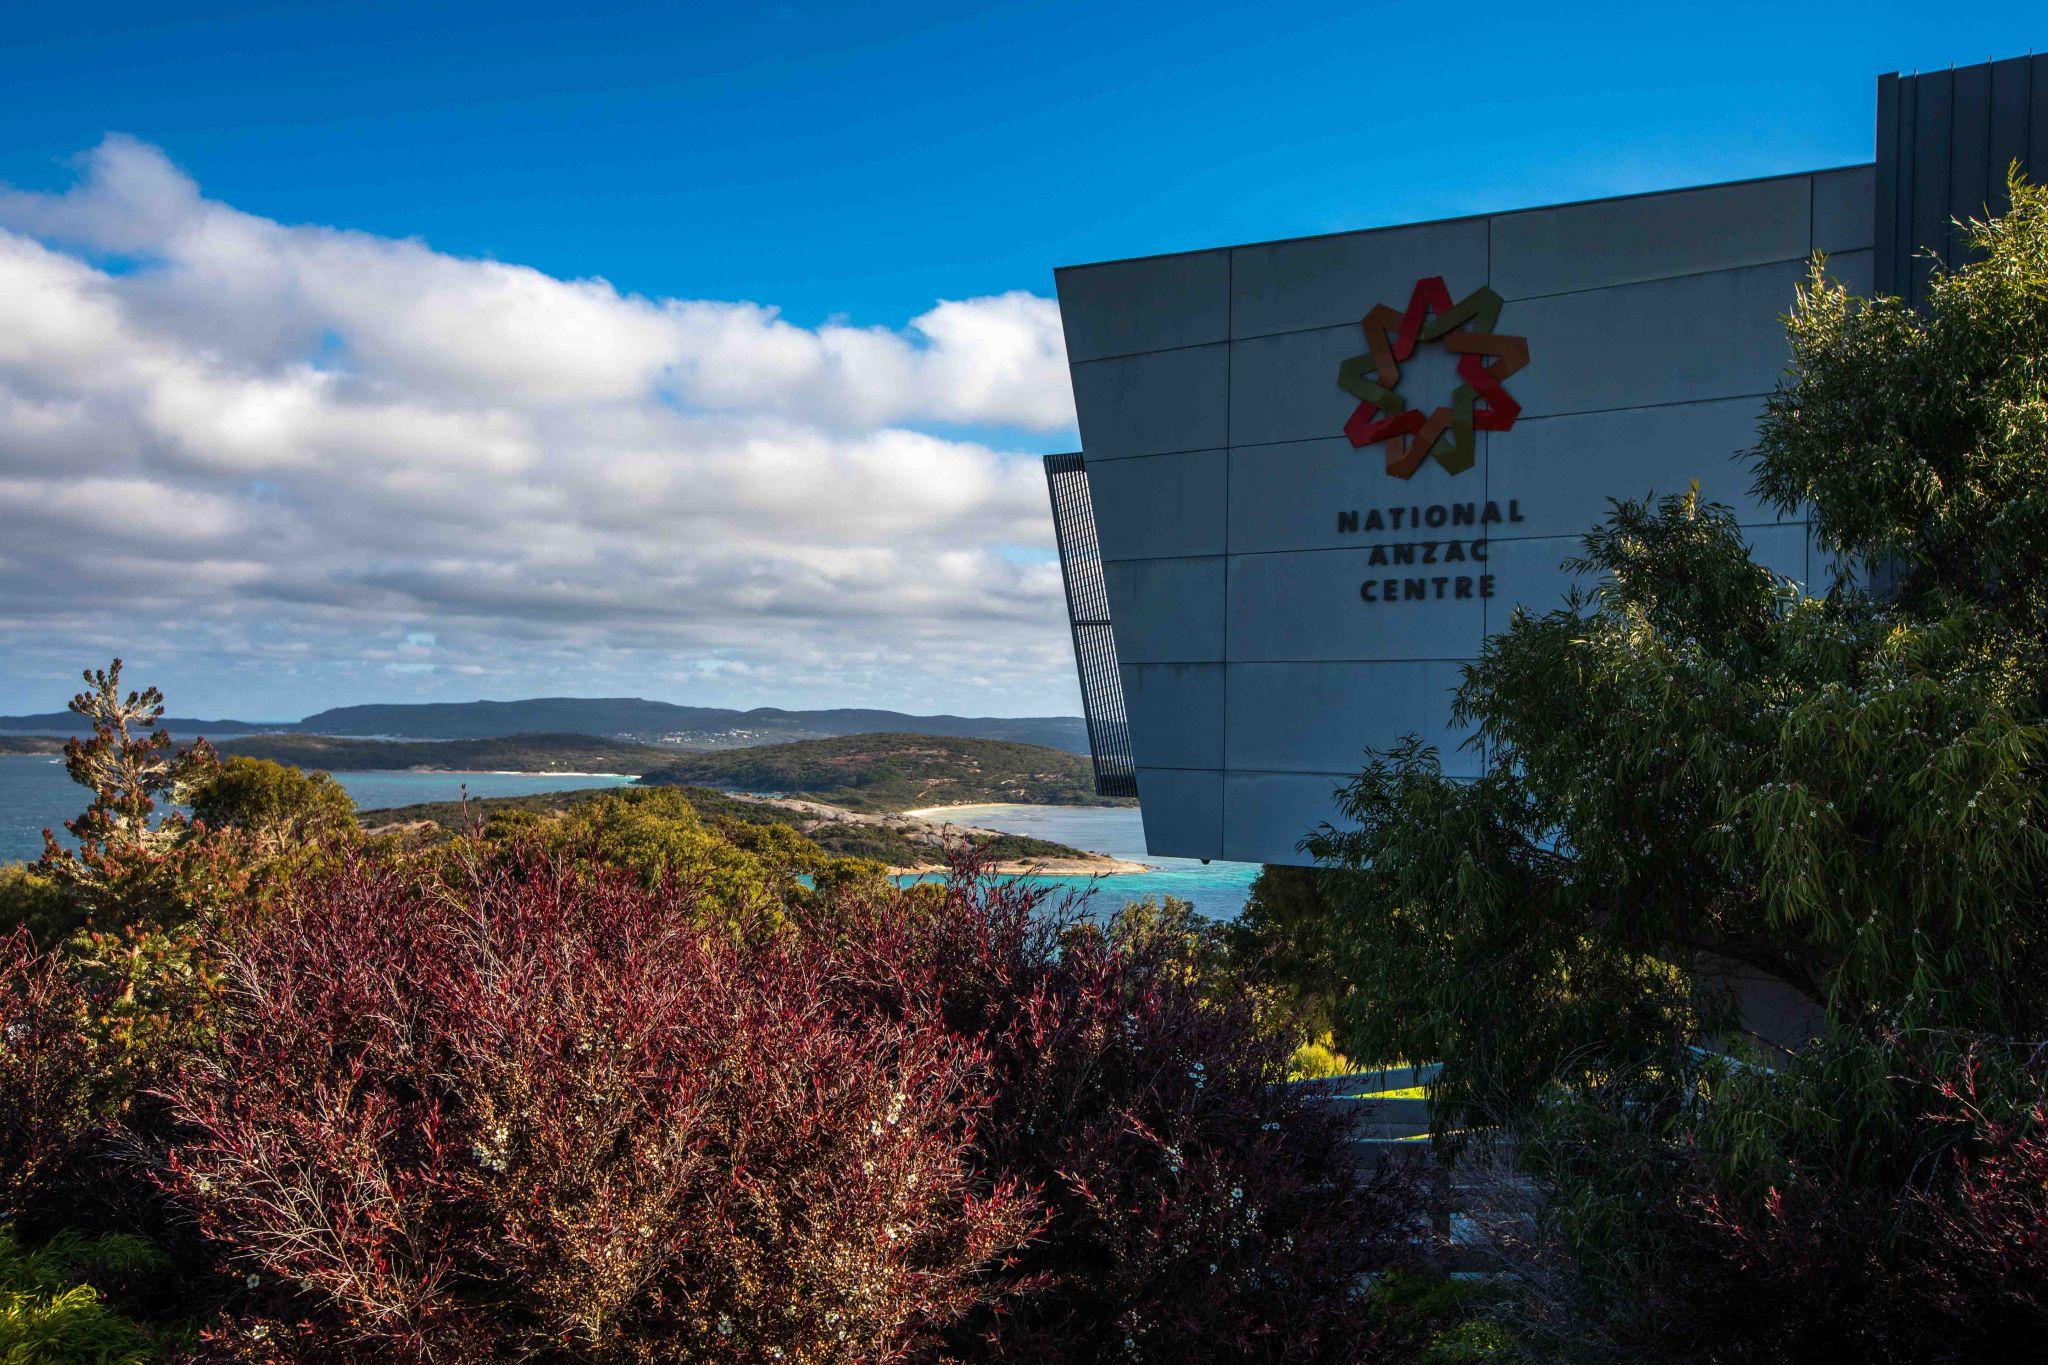 National ANZAC centre, Albany, Western Australia, Australia